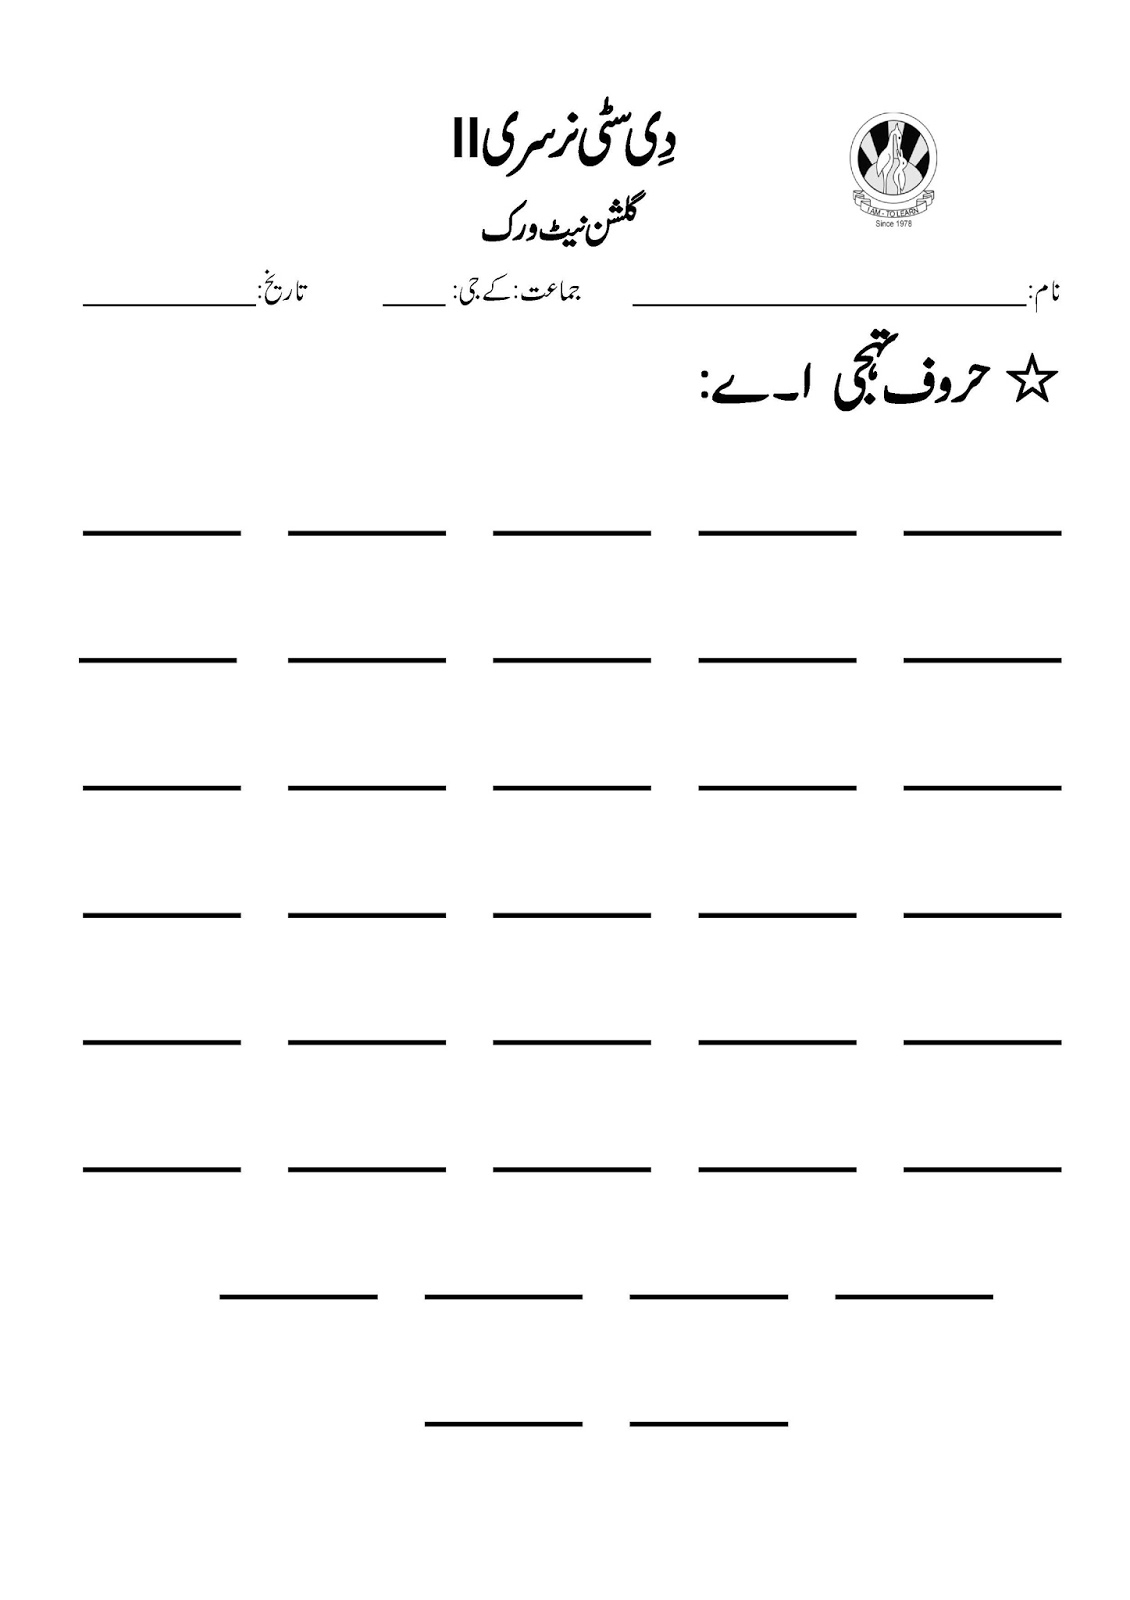 Urdu Ws Page 15 1 130 1 600 Pixels